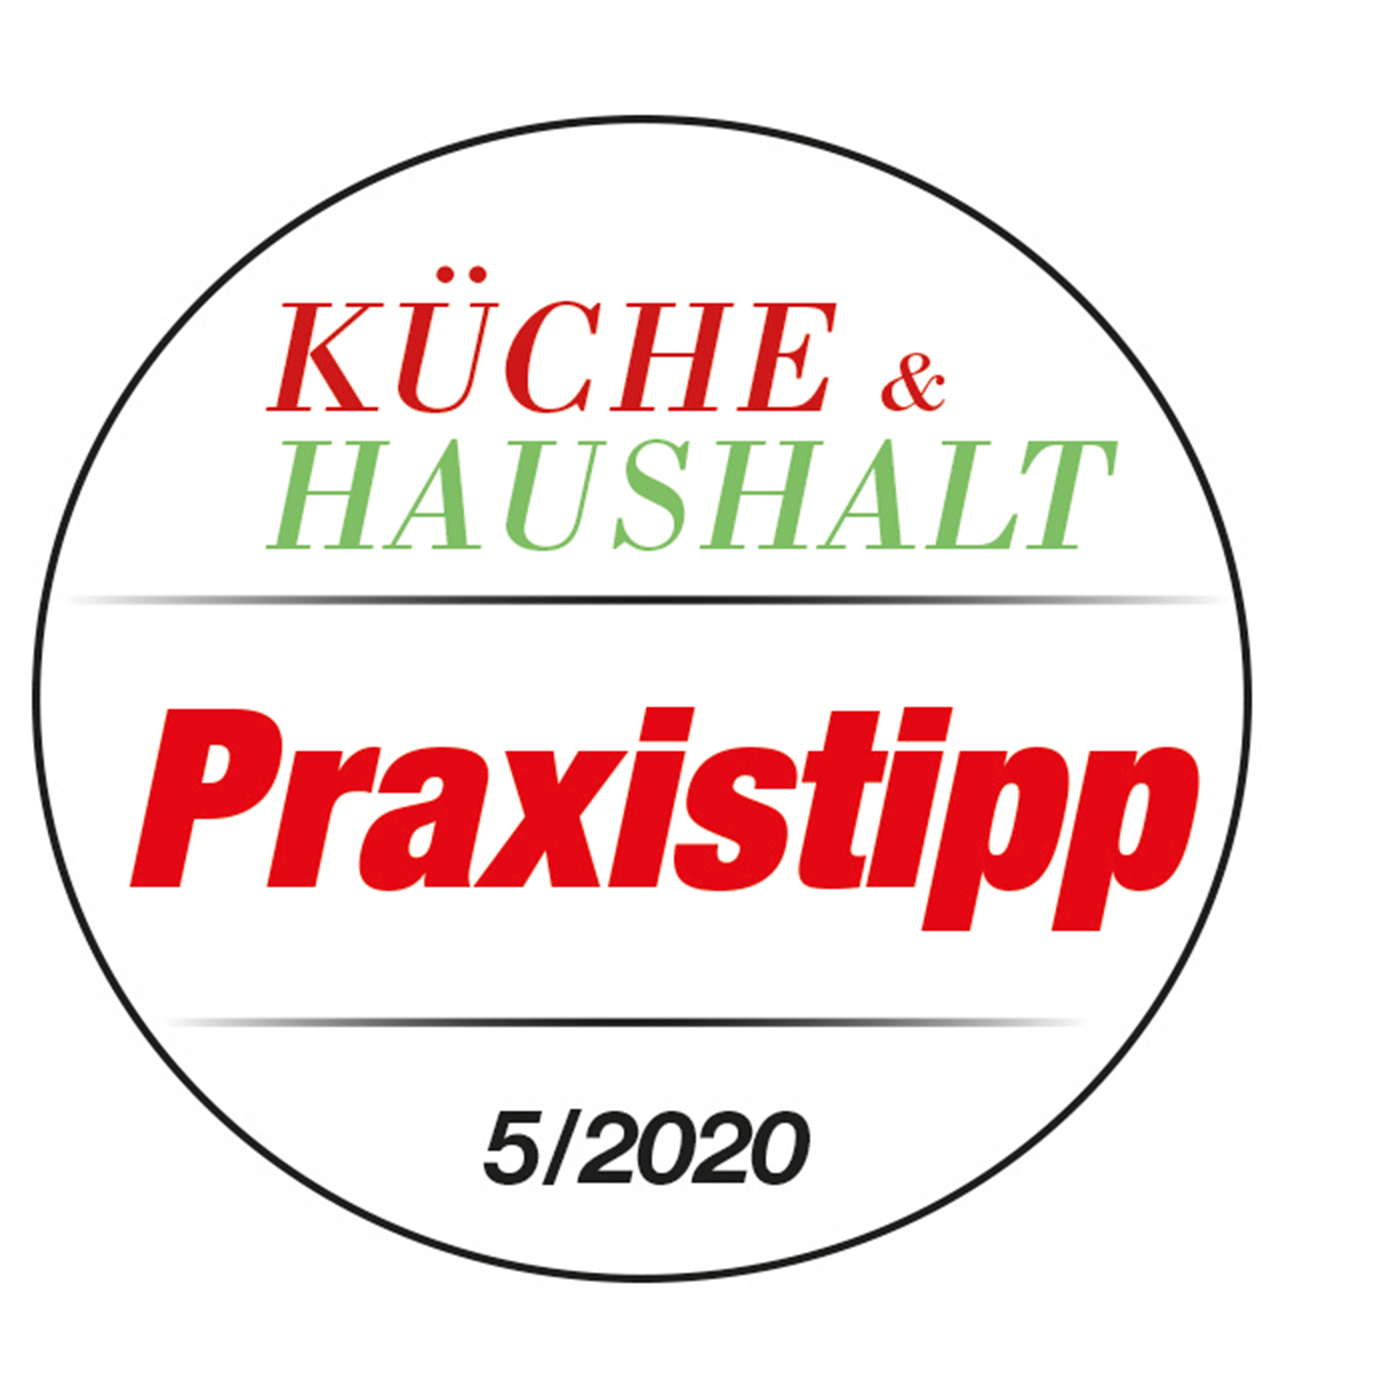 Graef Mini-Dörrautomat DA2042EU Kueche&Haushalt_05-2020-Praxistipp_Testlogo